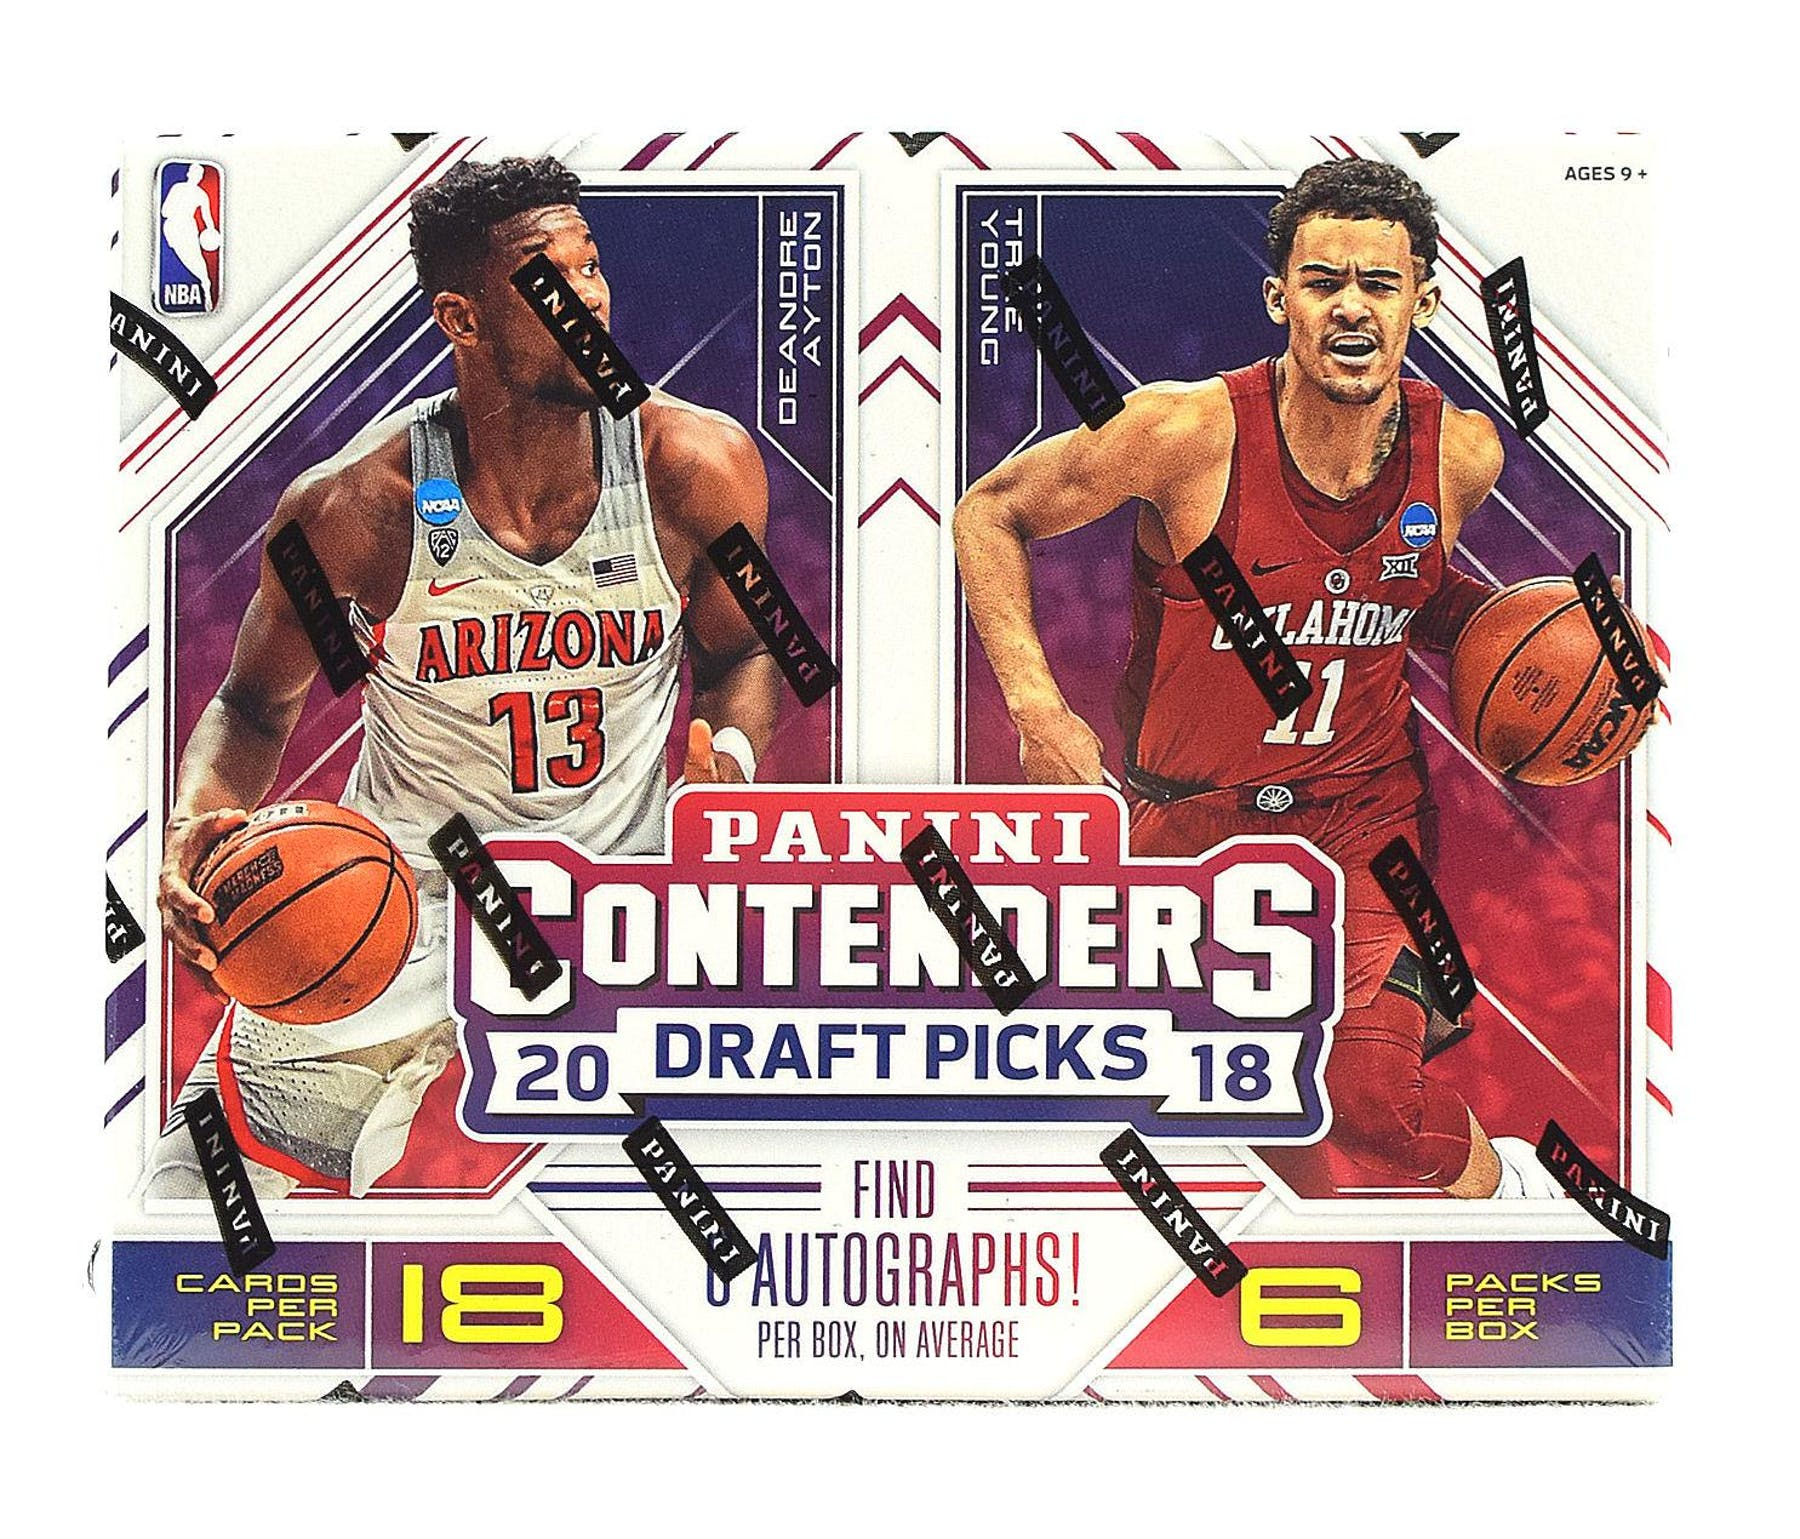 d906bf21b 2018 19 Panini Contenders Draft Basketball Hobby Box